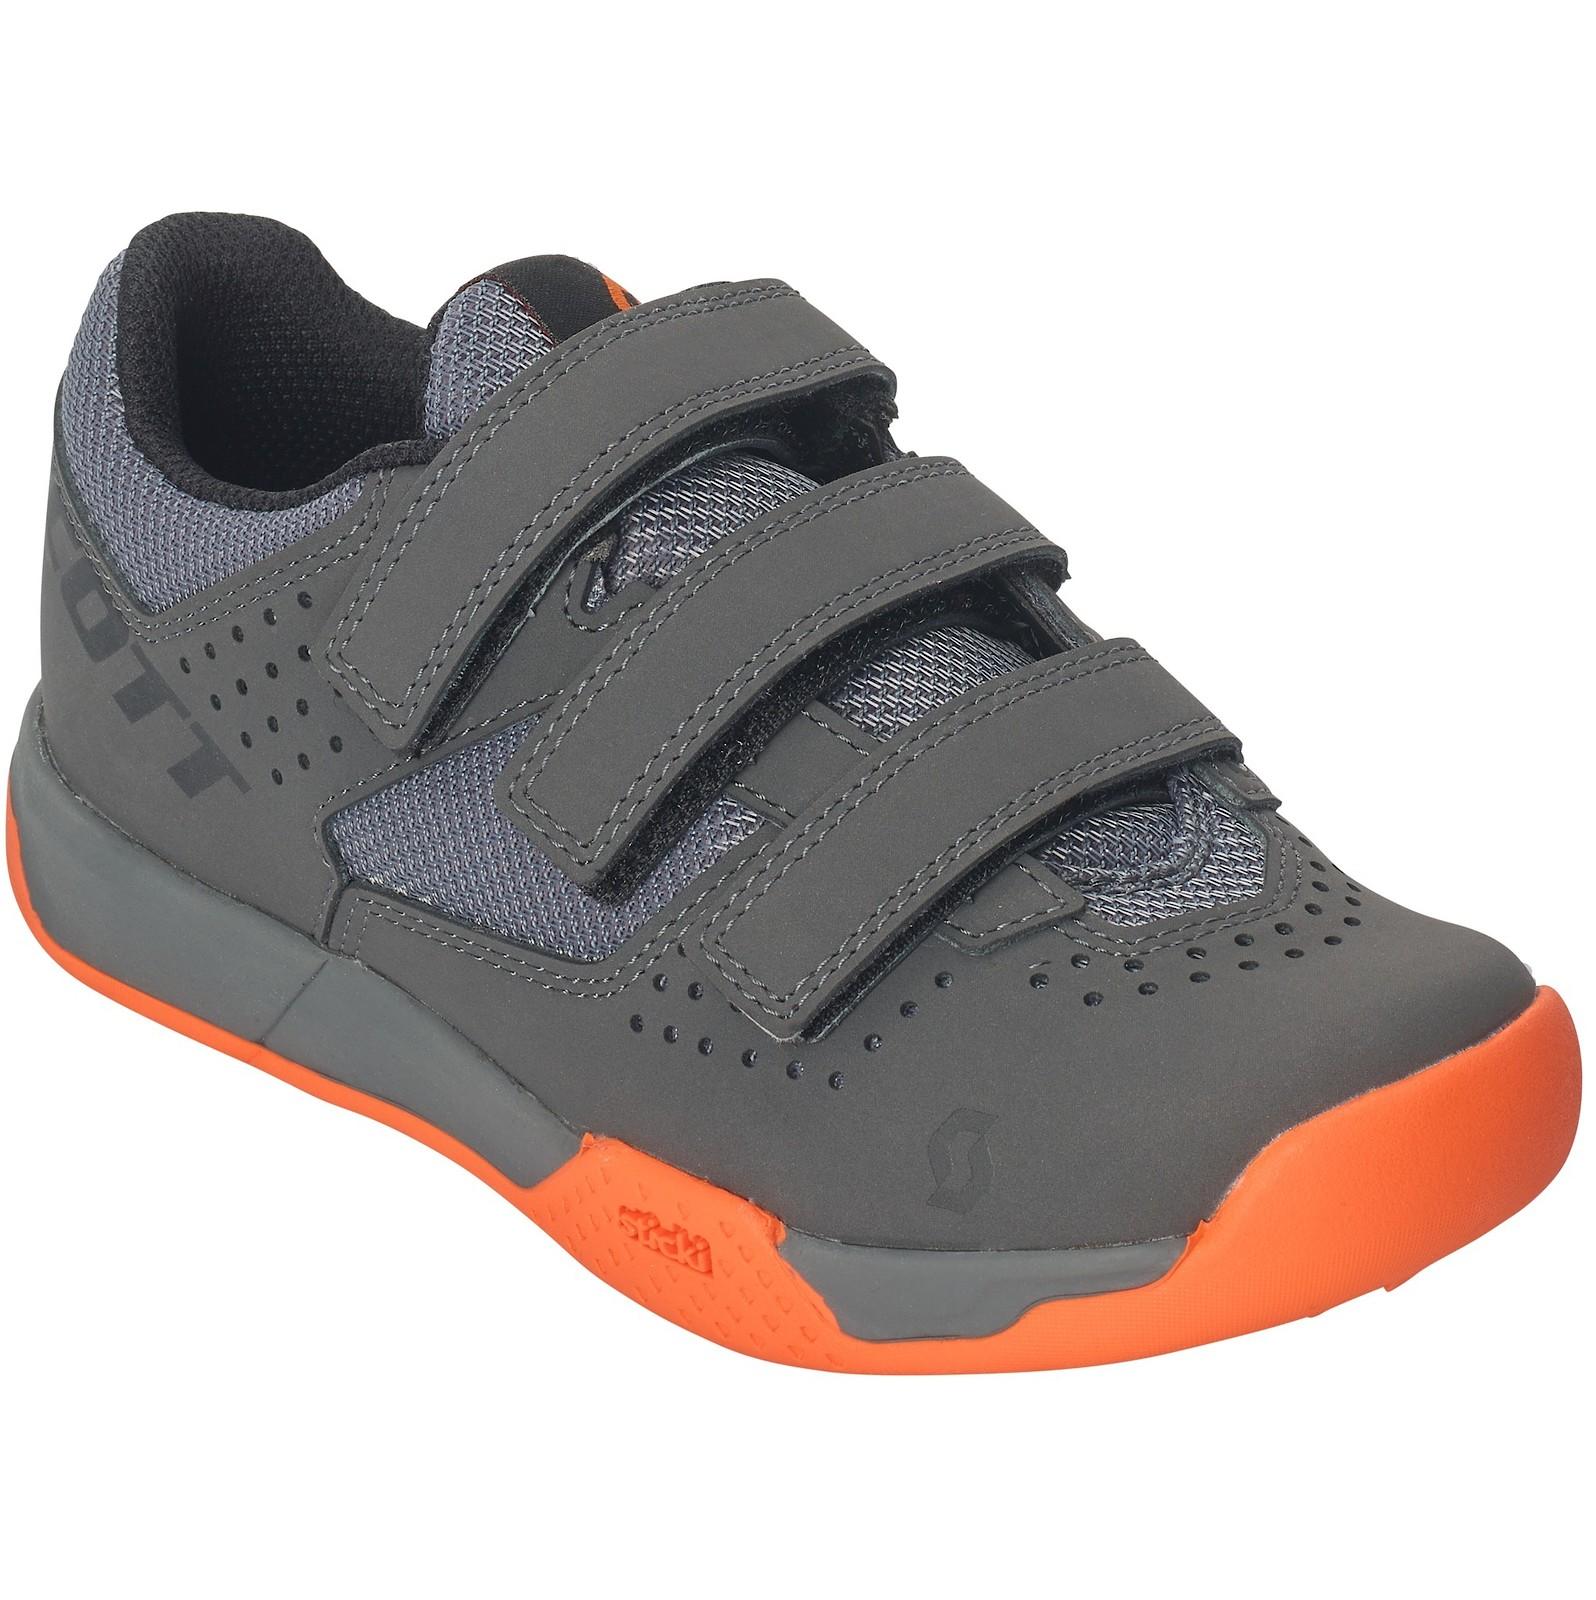 Scott AR Kid's Strap shoe in grey/orange